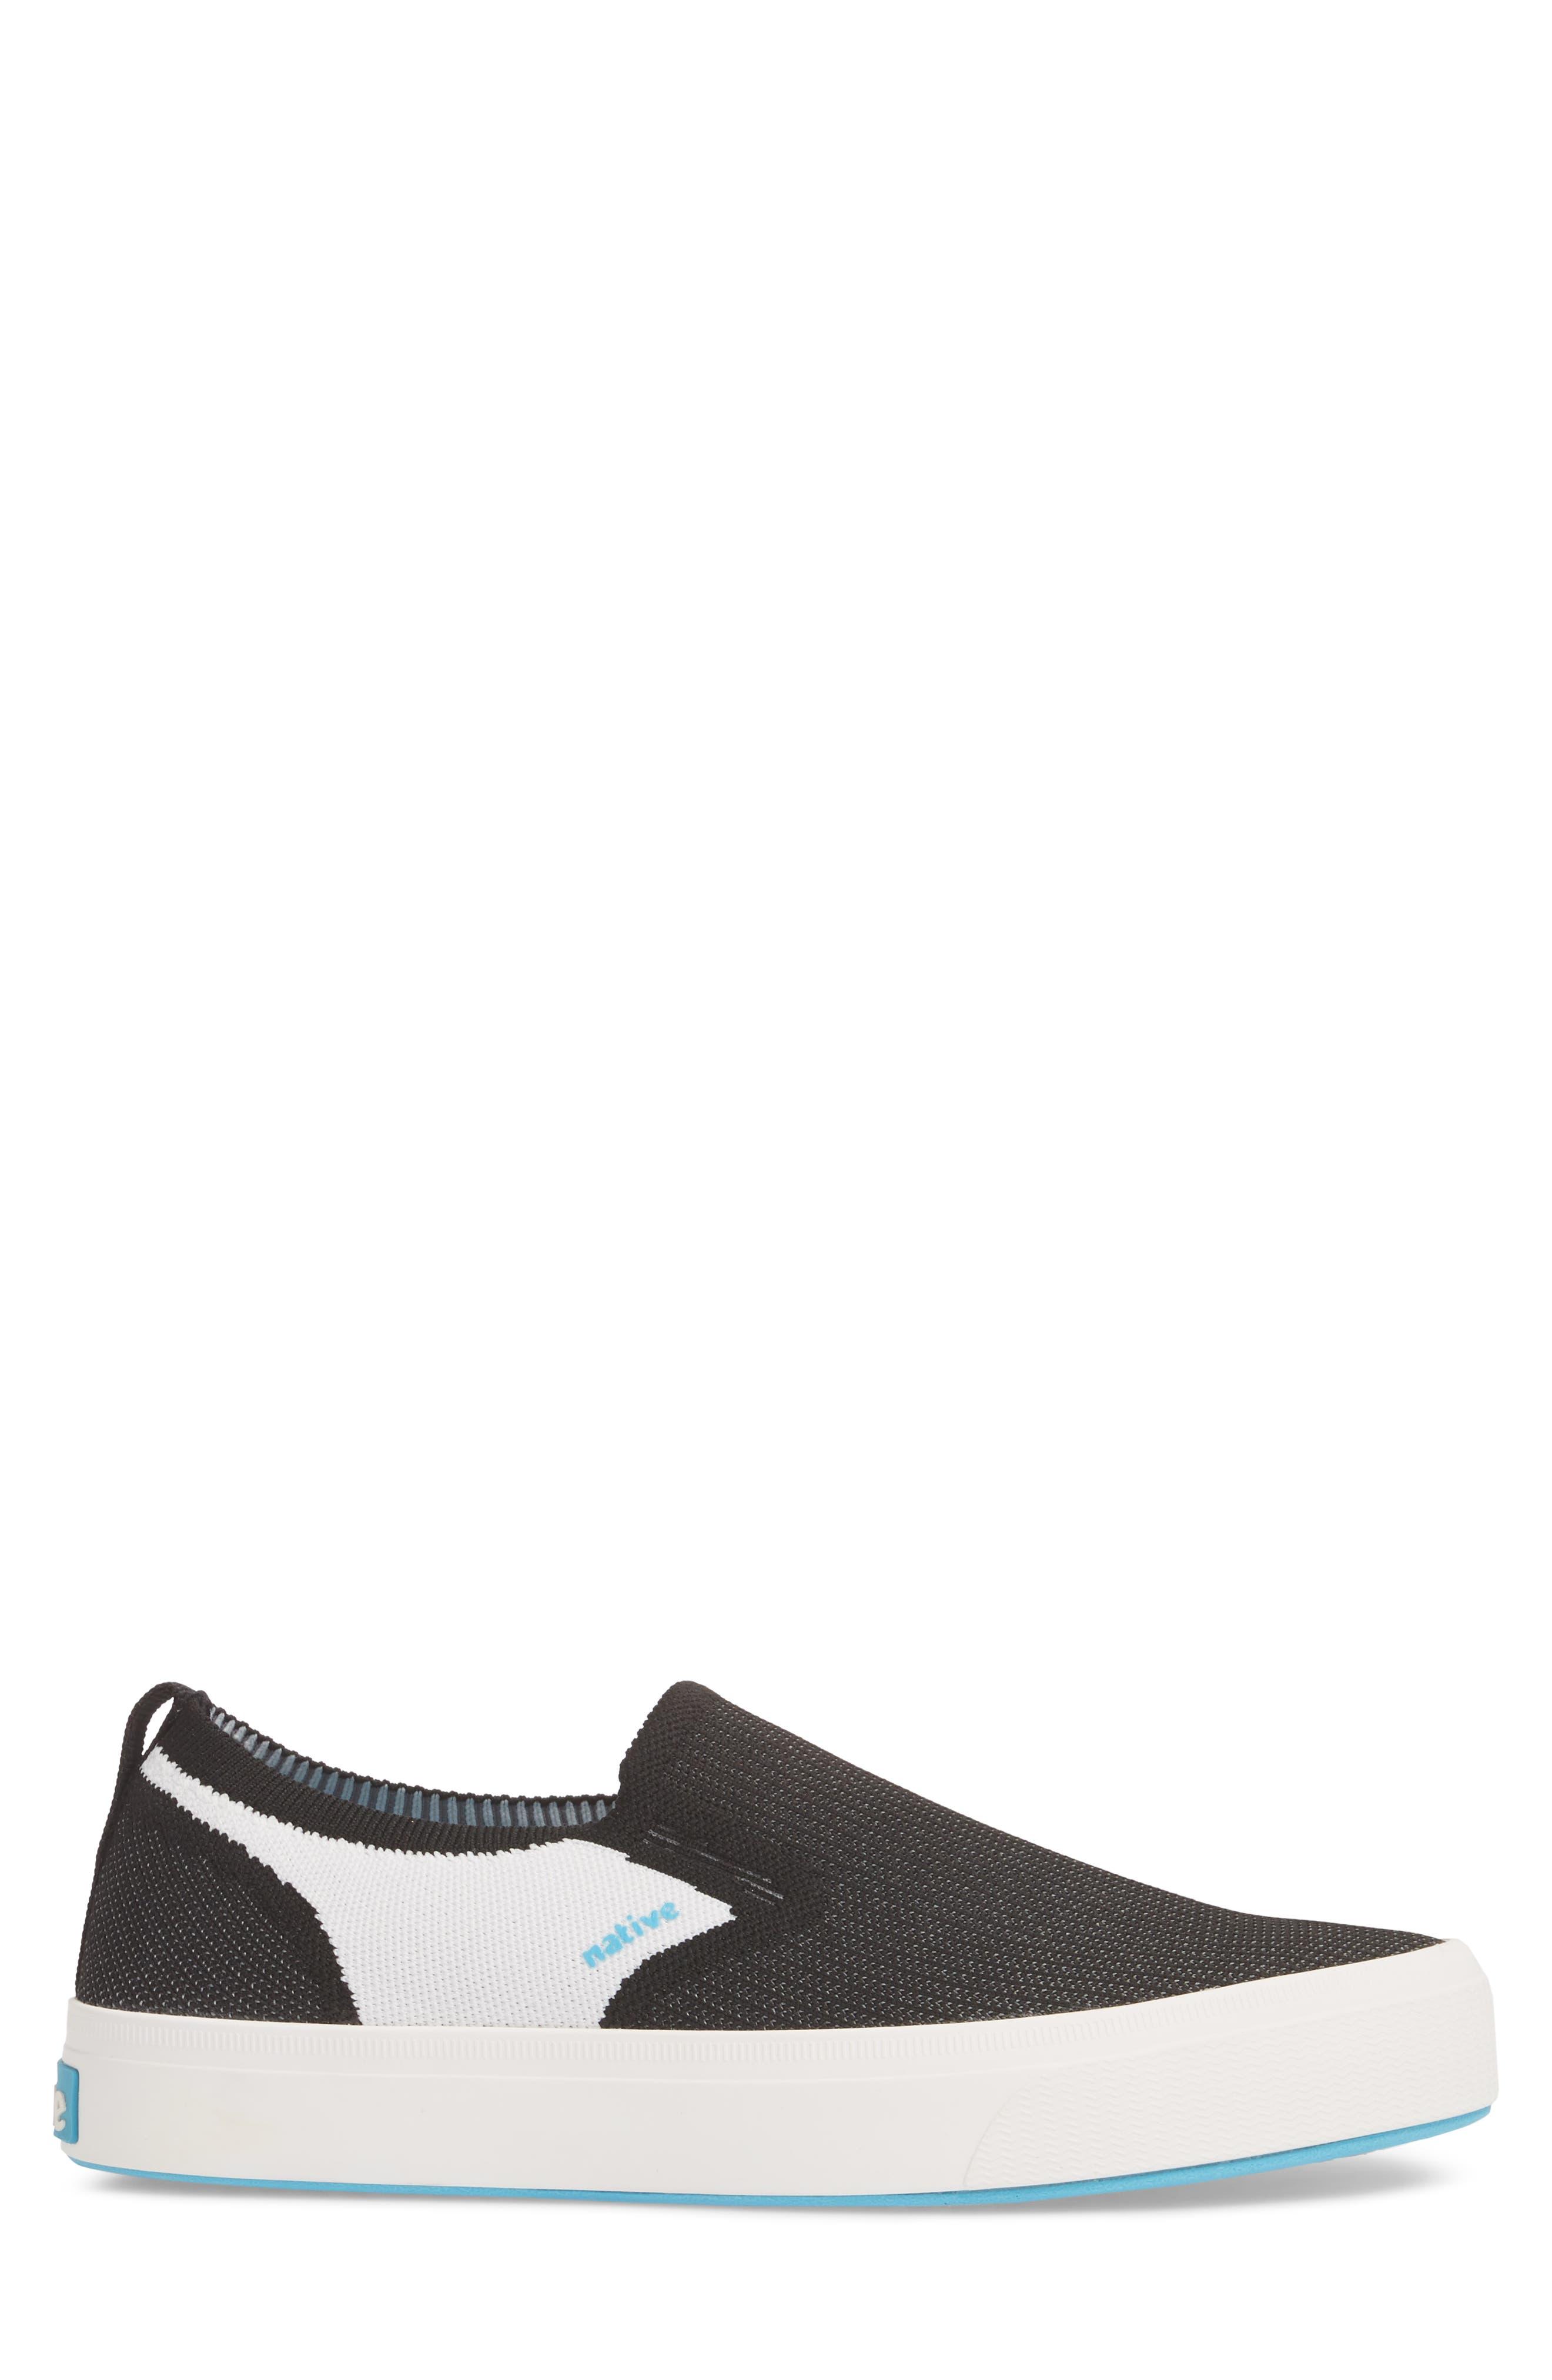 Native Miles LiteKnit Slip-On Sneaker,                             Alternate thumbnail 3, color,                             Jiffy Black/ Shell White